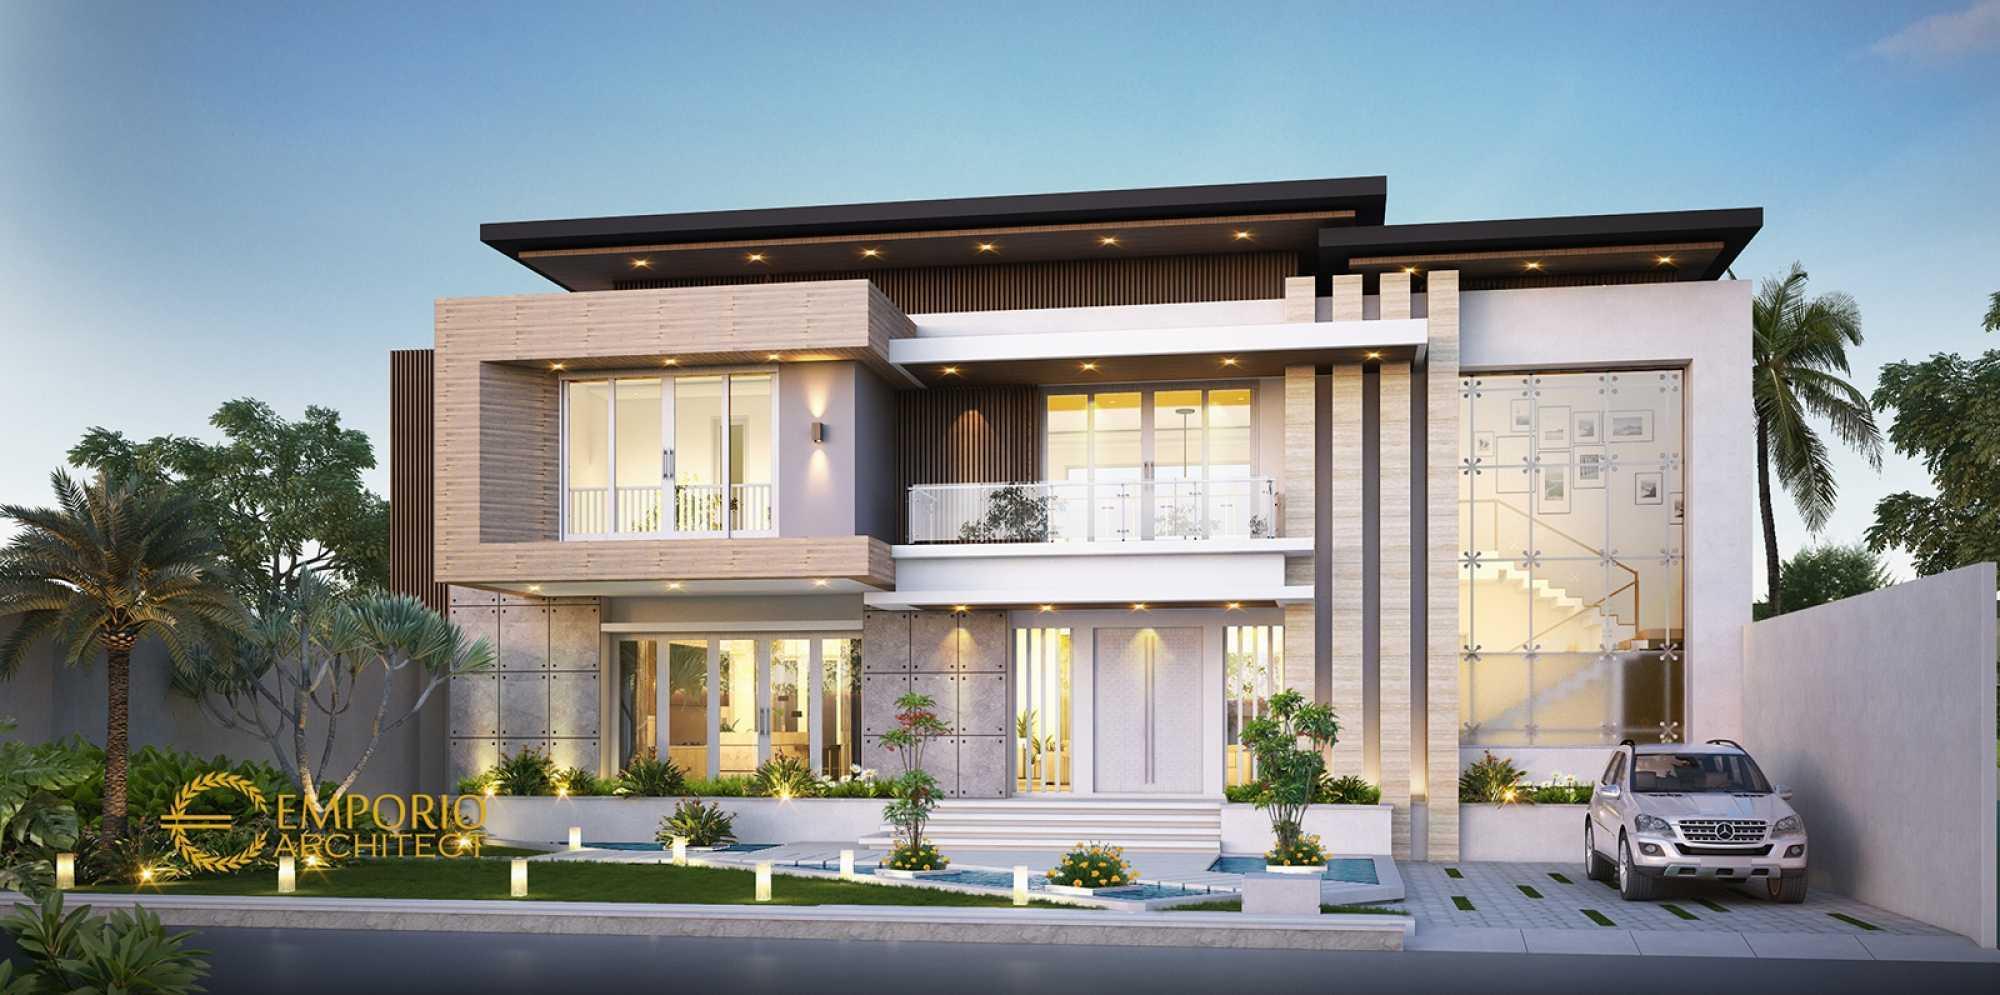 Emporio Architect di Nusa Tenggara Timur